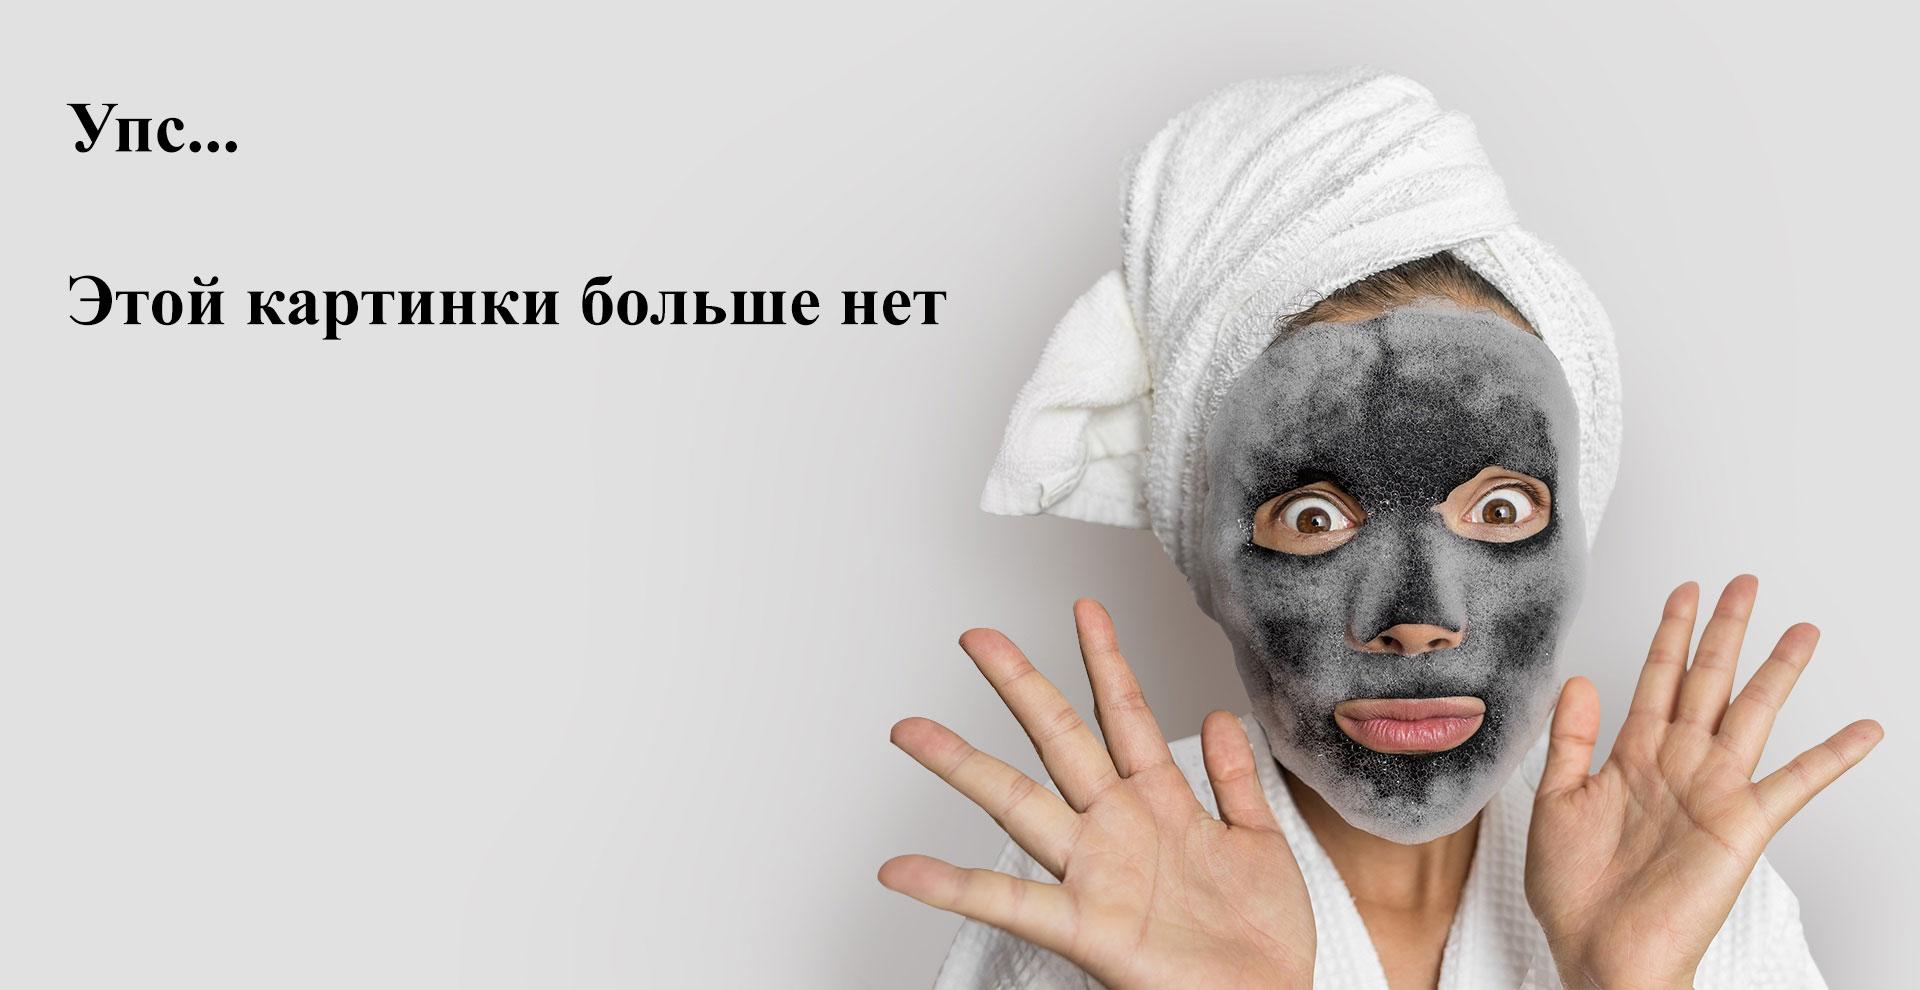 La Roche-Posay, Крем для нормальной кожи Redermic C, 40 мл